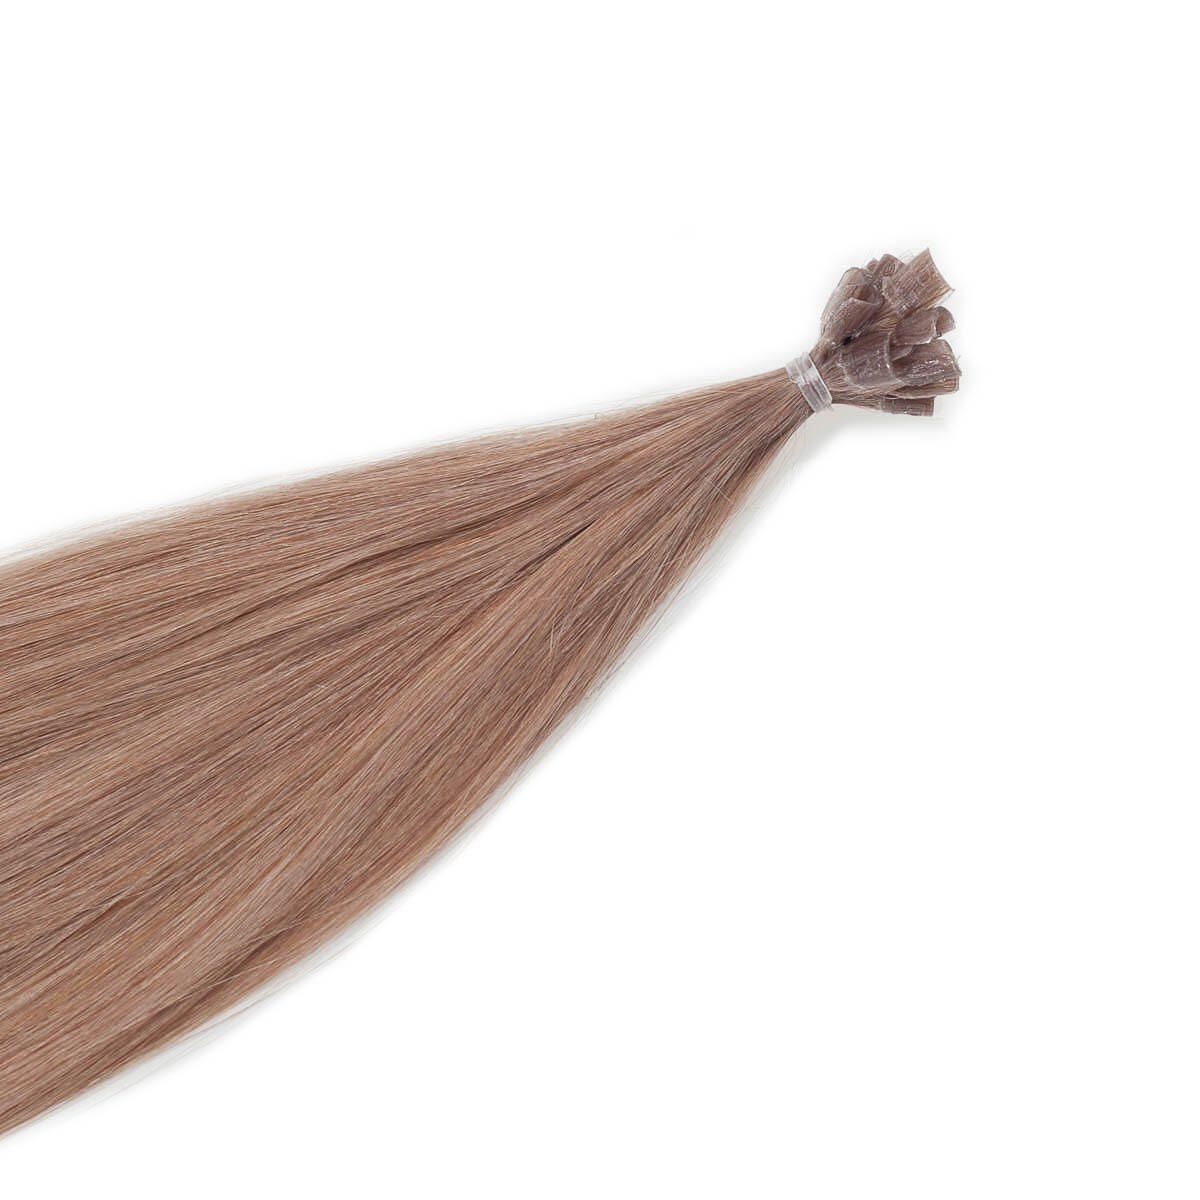 Nail Hair Original 7.1 Natural Ash 40 cm